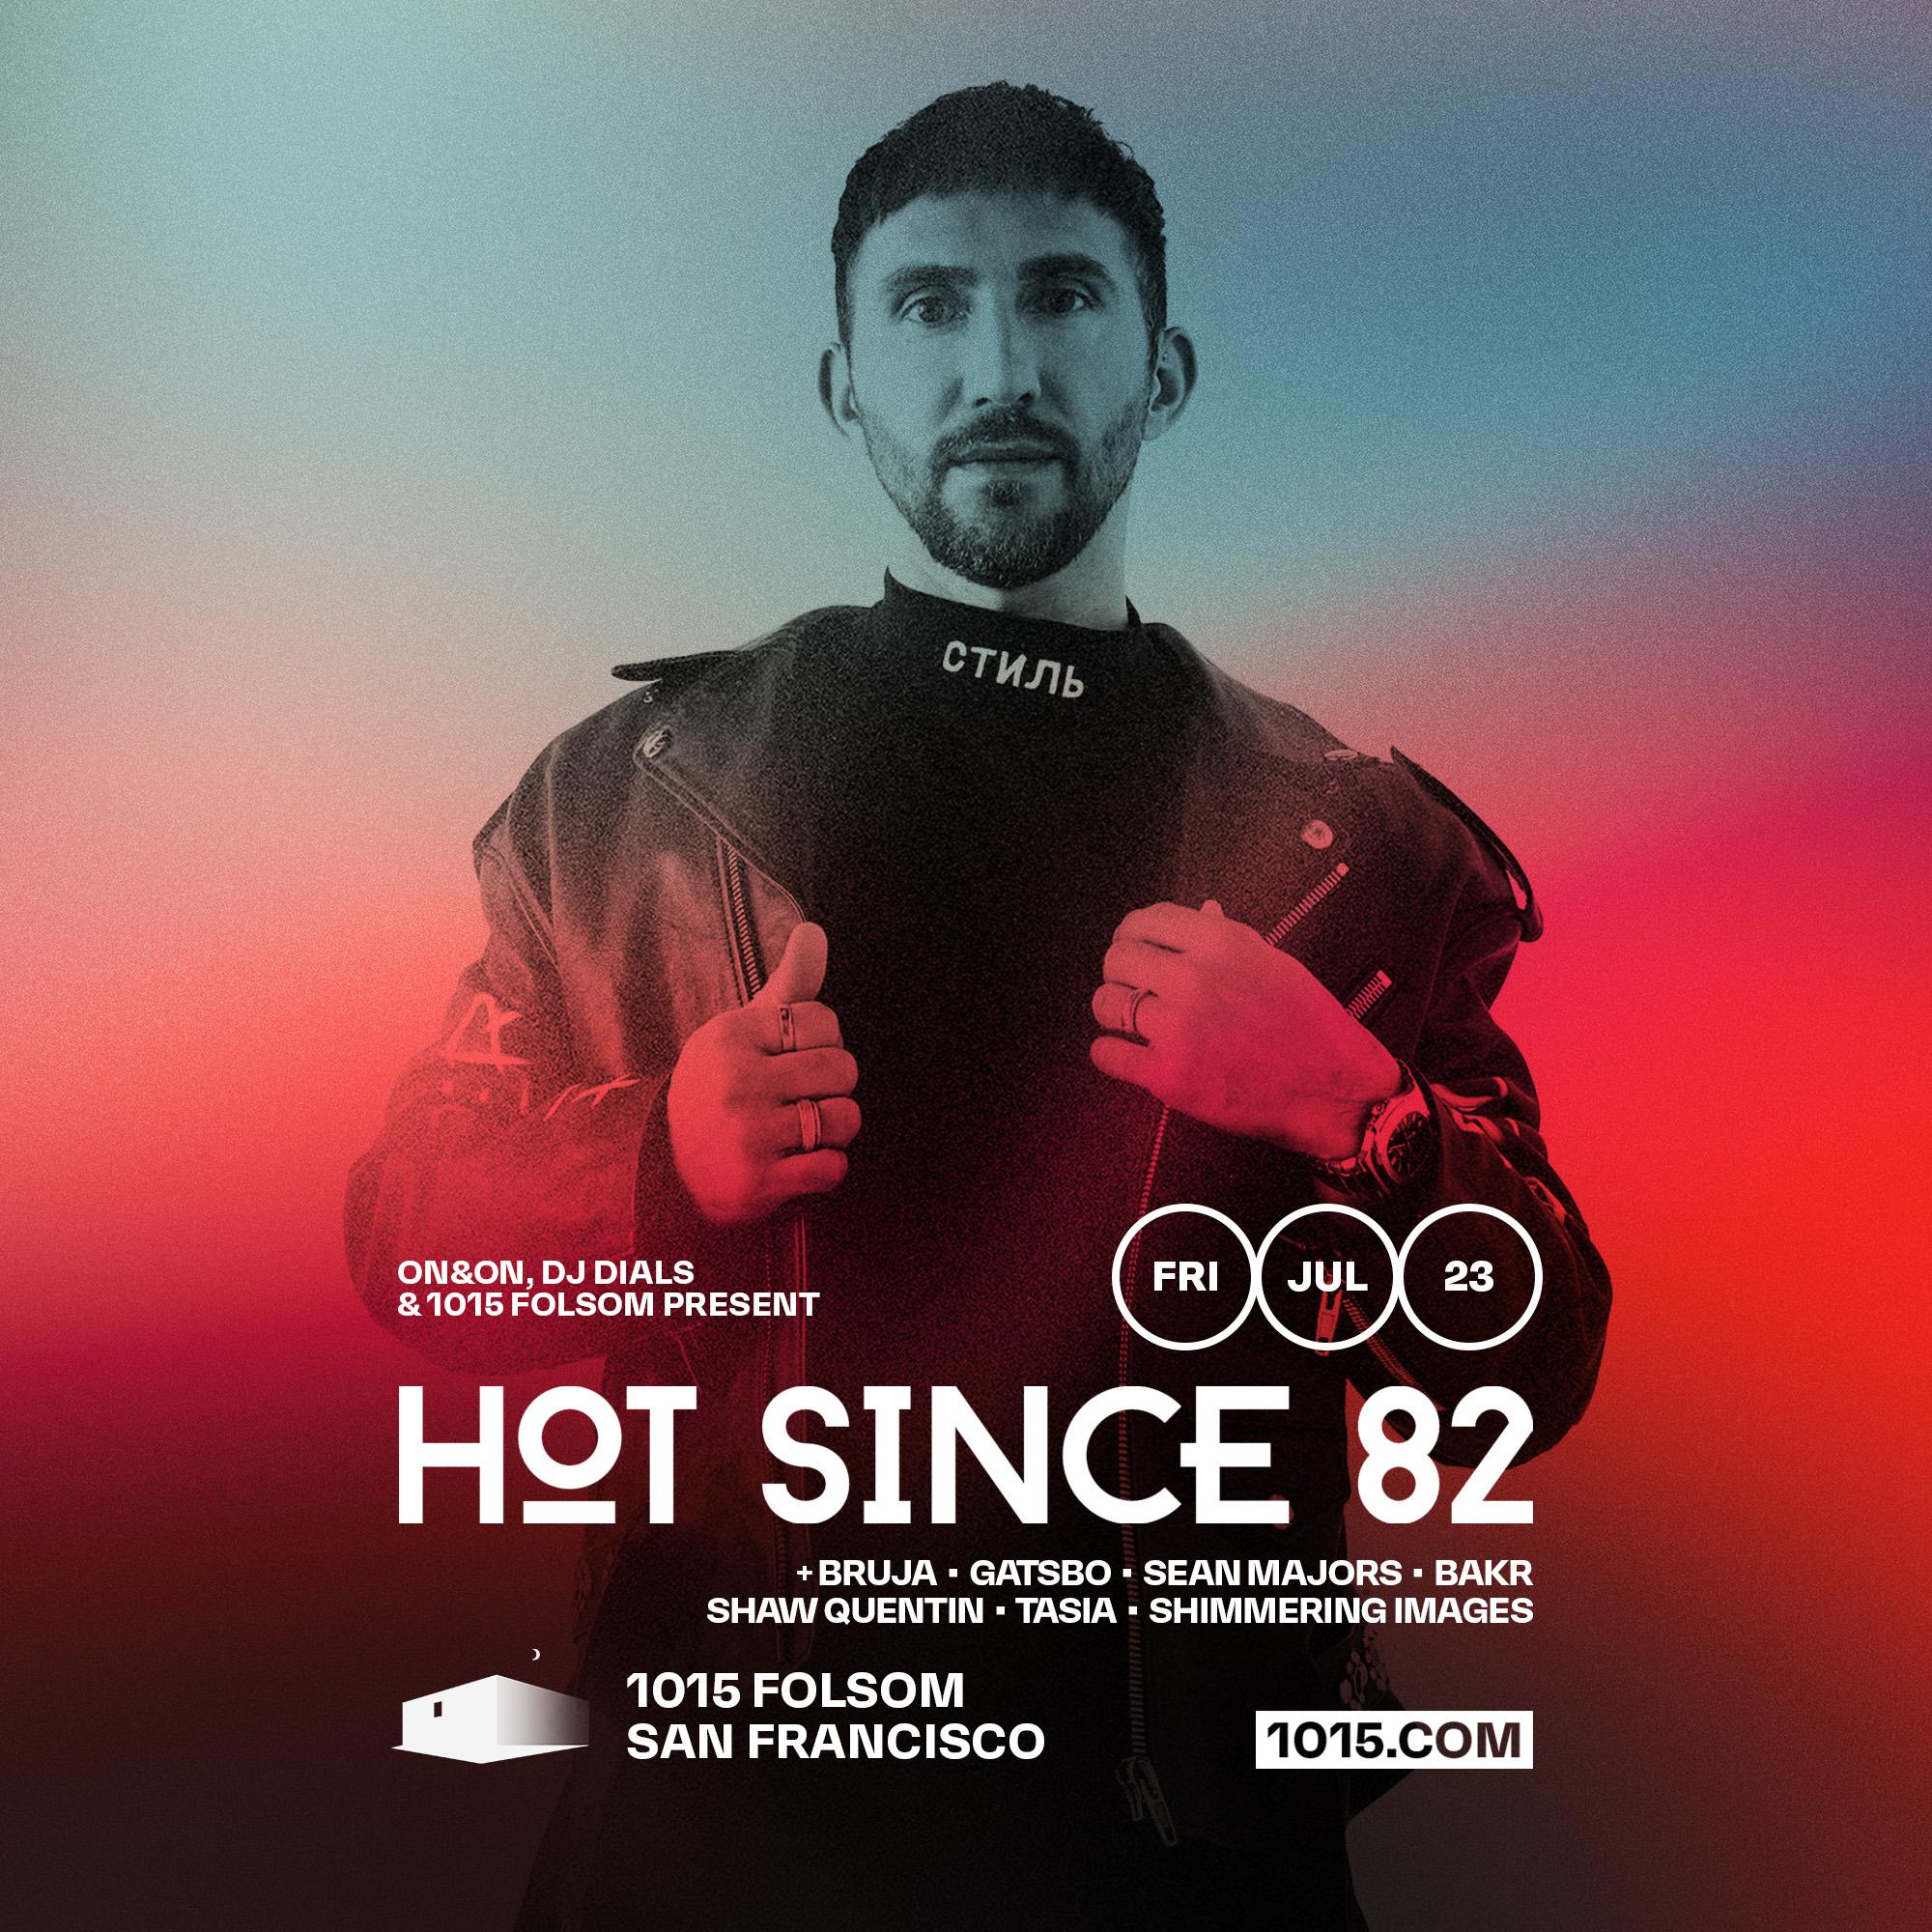 Hot Since 82: